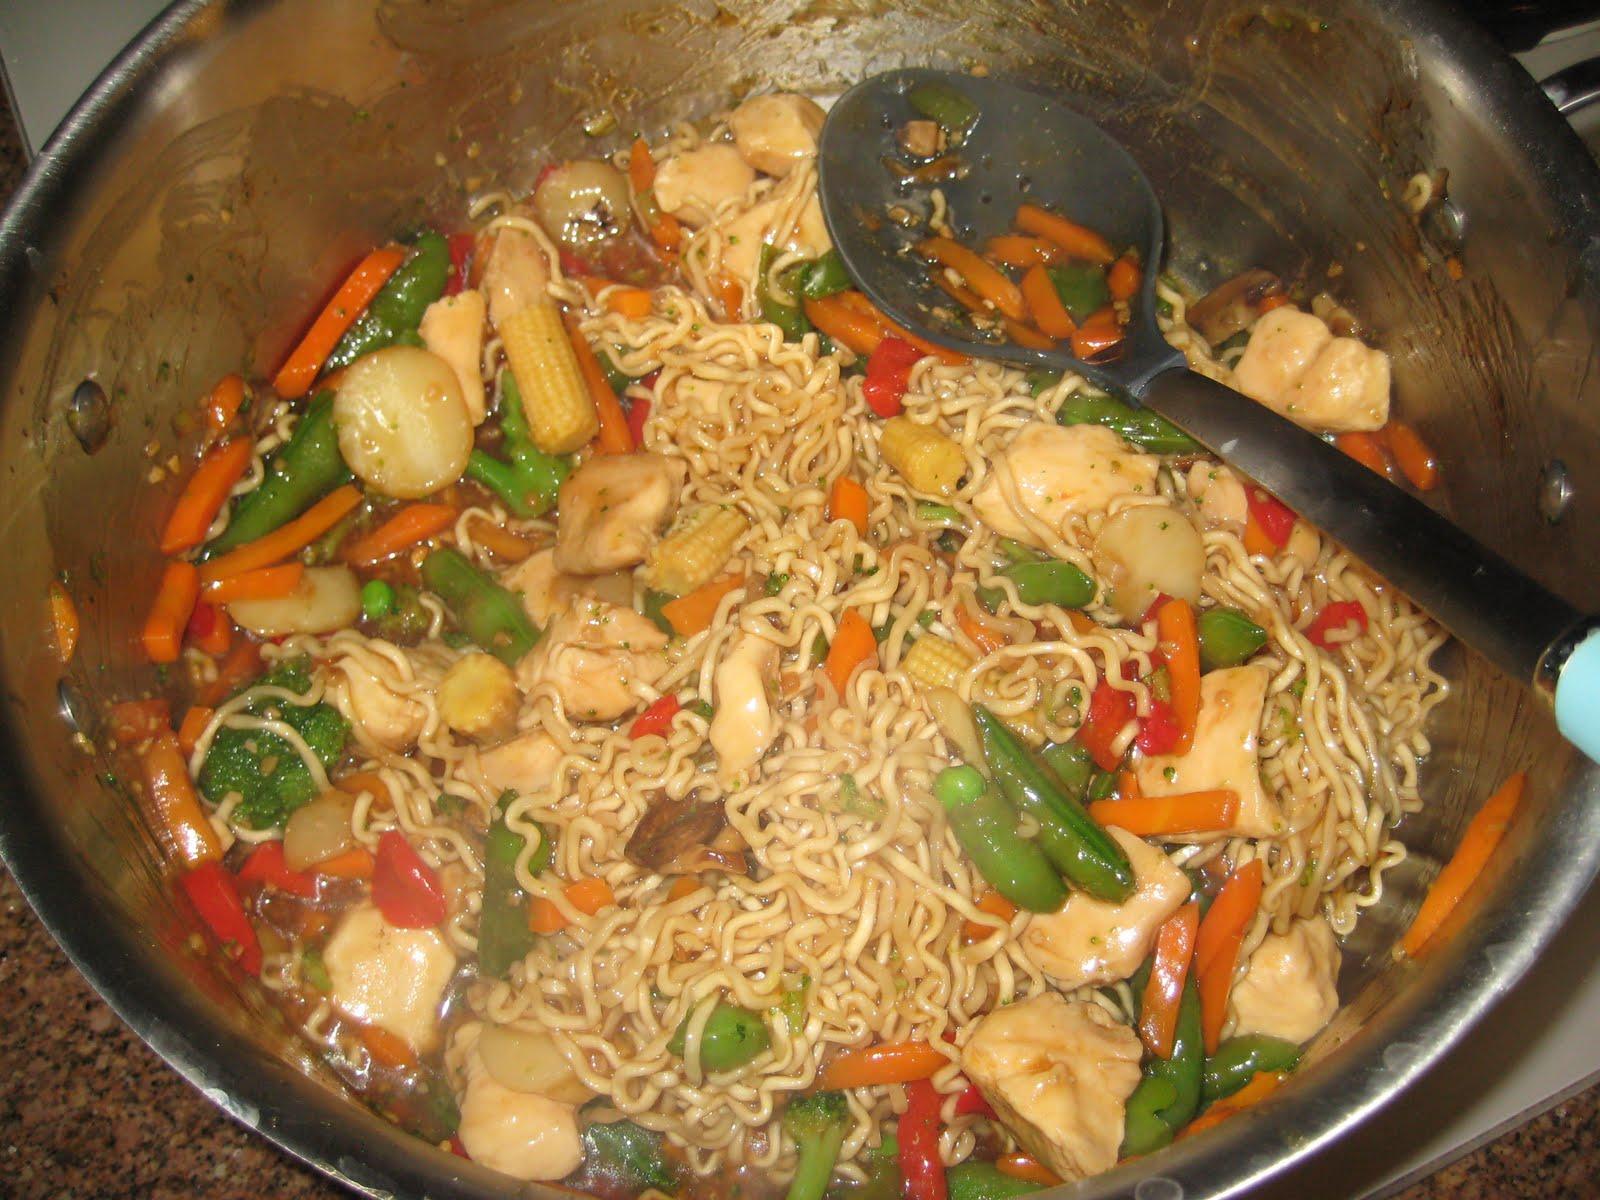 corn with recipe ramen Recipes: Ramen and Teriyaki Exercise: Stir Rondi's Chicken fry